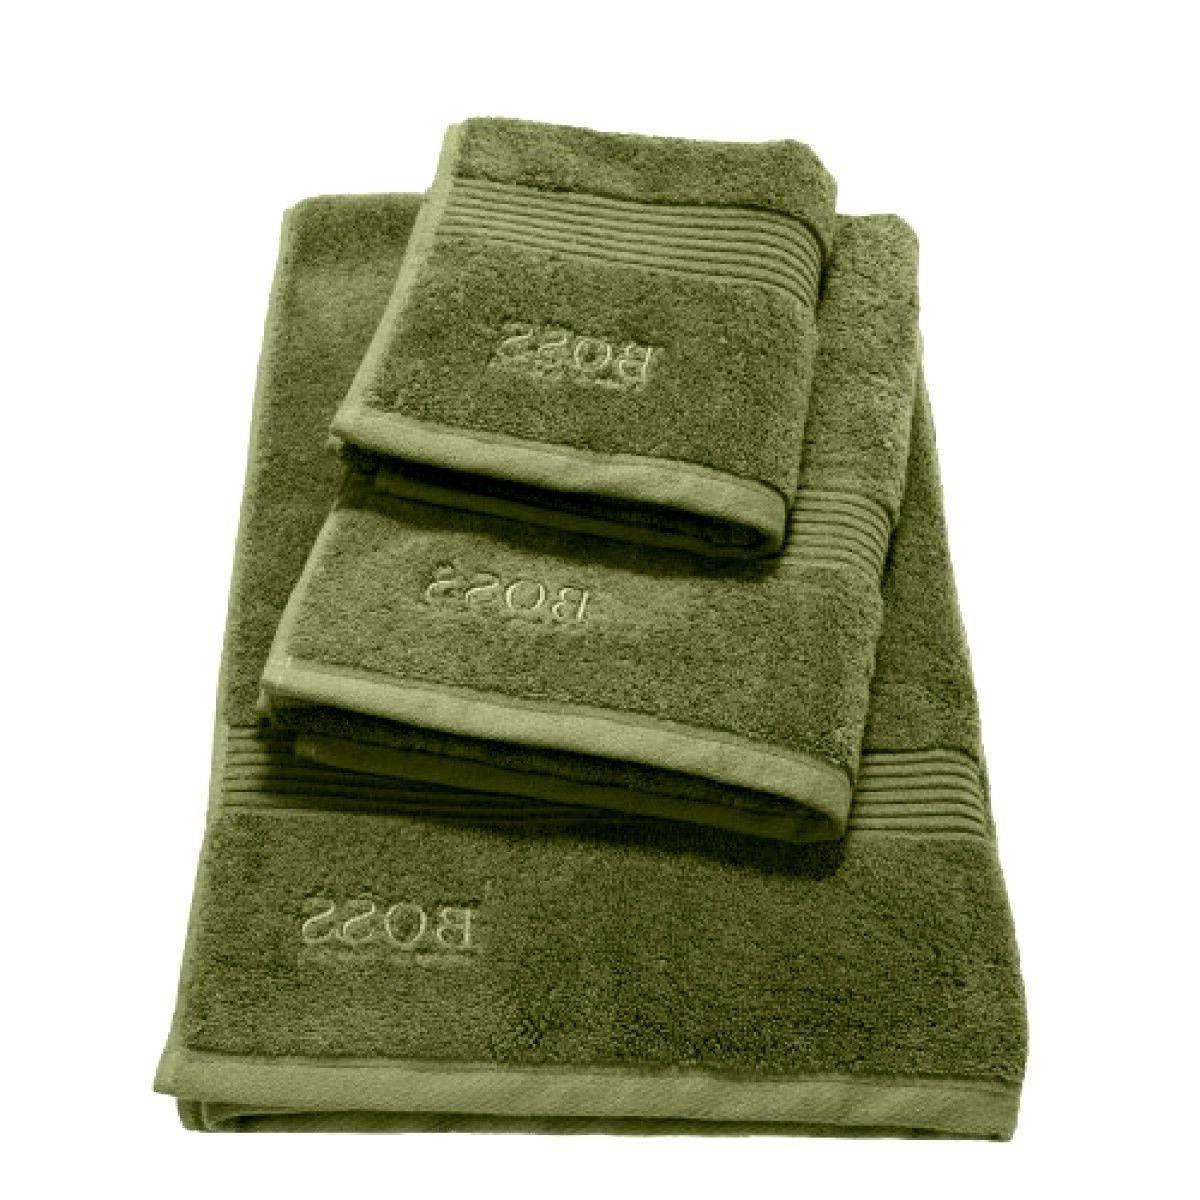 HUGO BOSS LOFT SOLID COTTON BATH / GUEST TOWEL IN MULTIPLE C